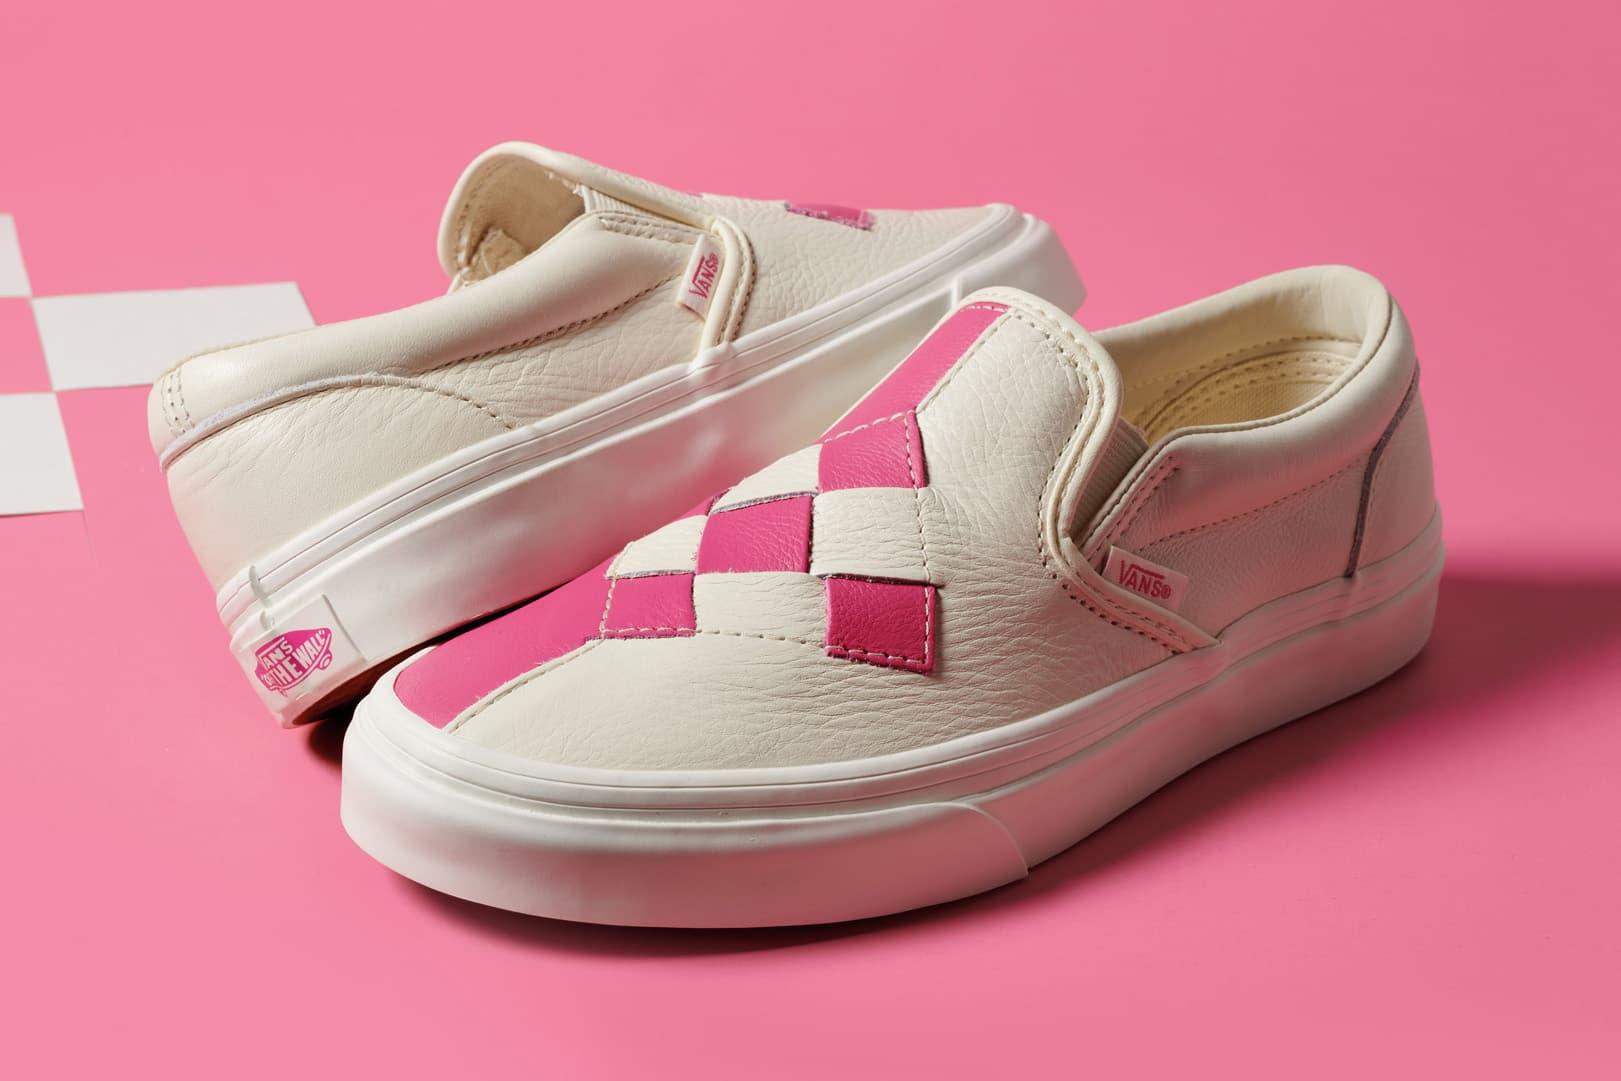 Vans Woven Leather Checkerboard Slip On Sneakers Hypebae